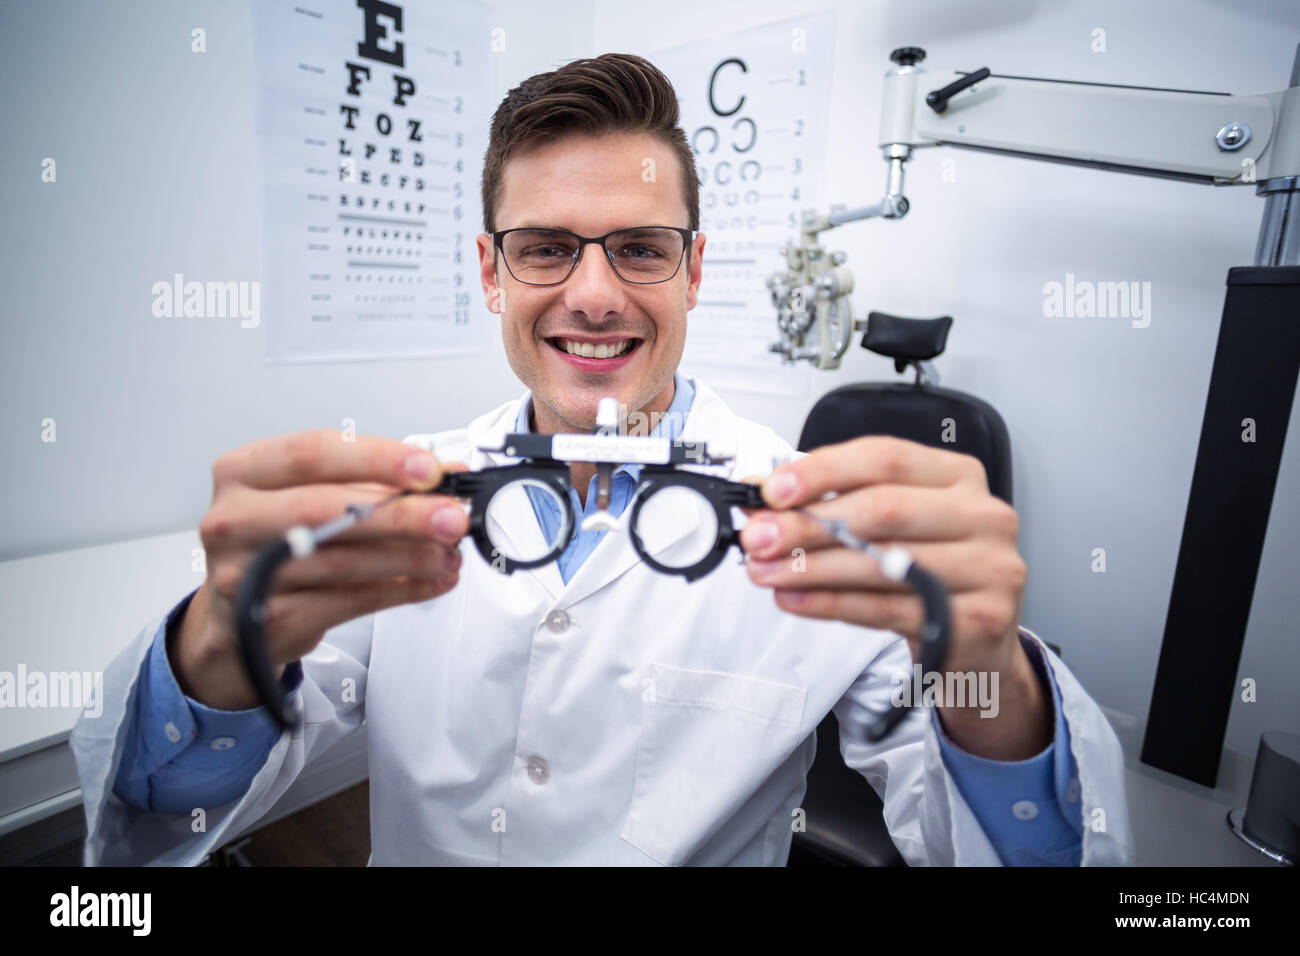 Smiling optometrist holding messbrille - Stock Image